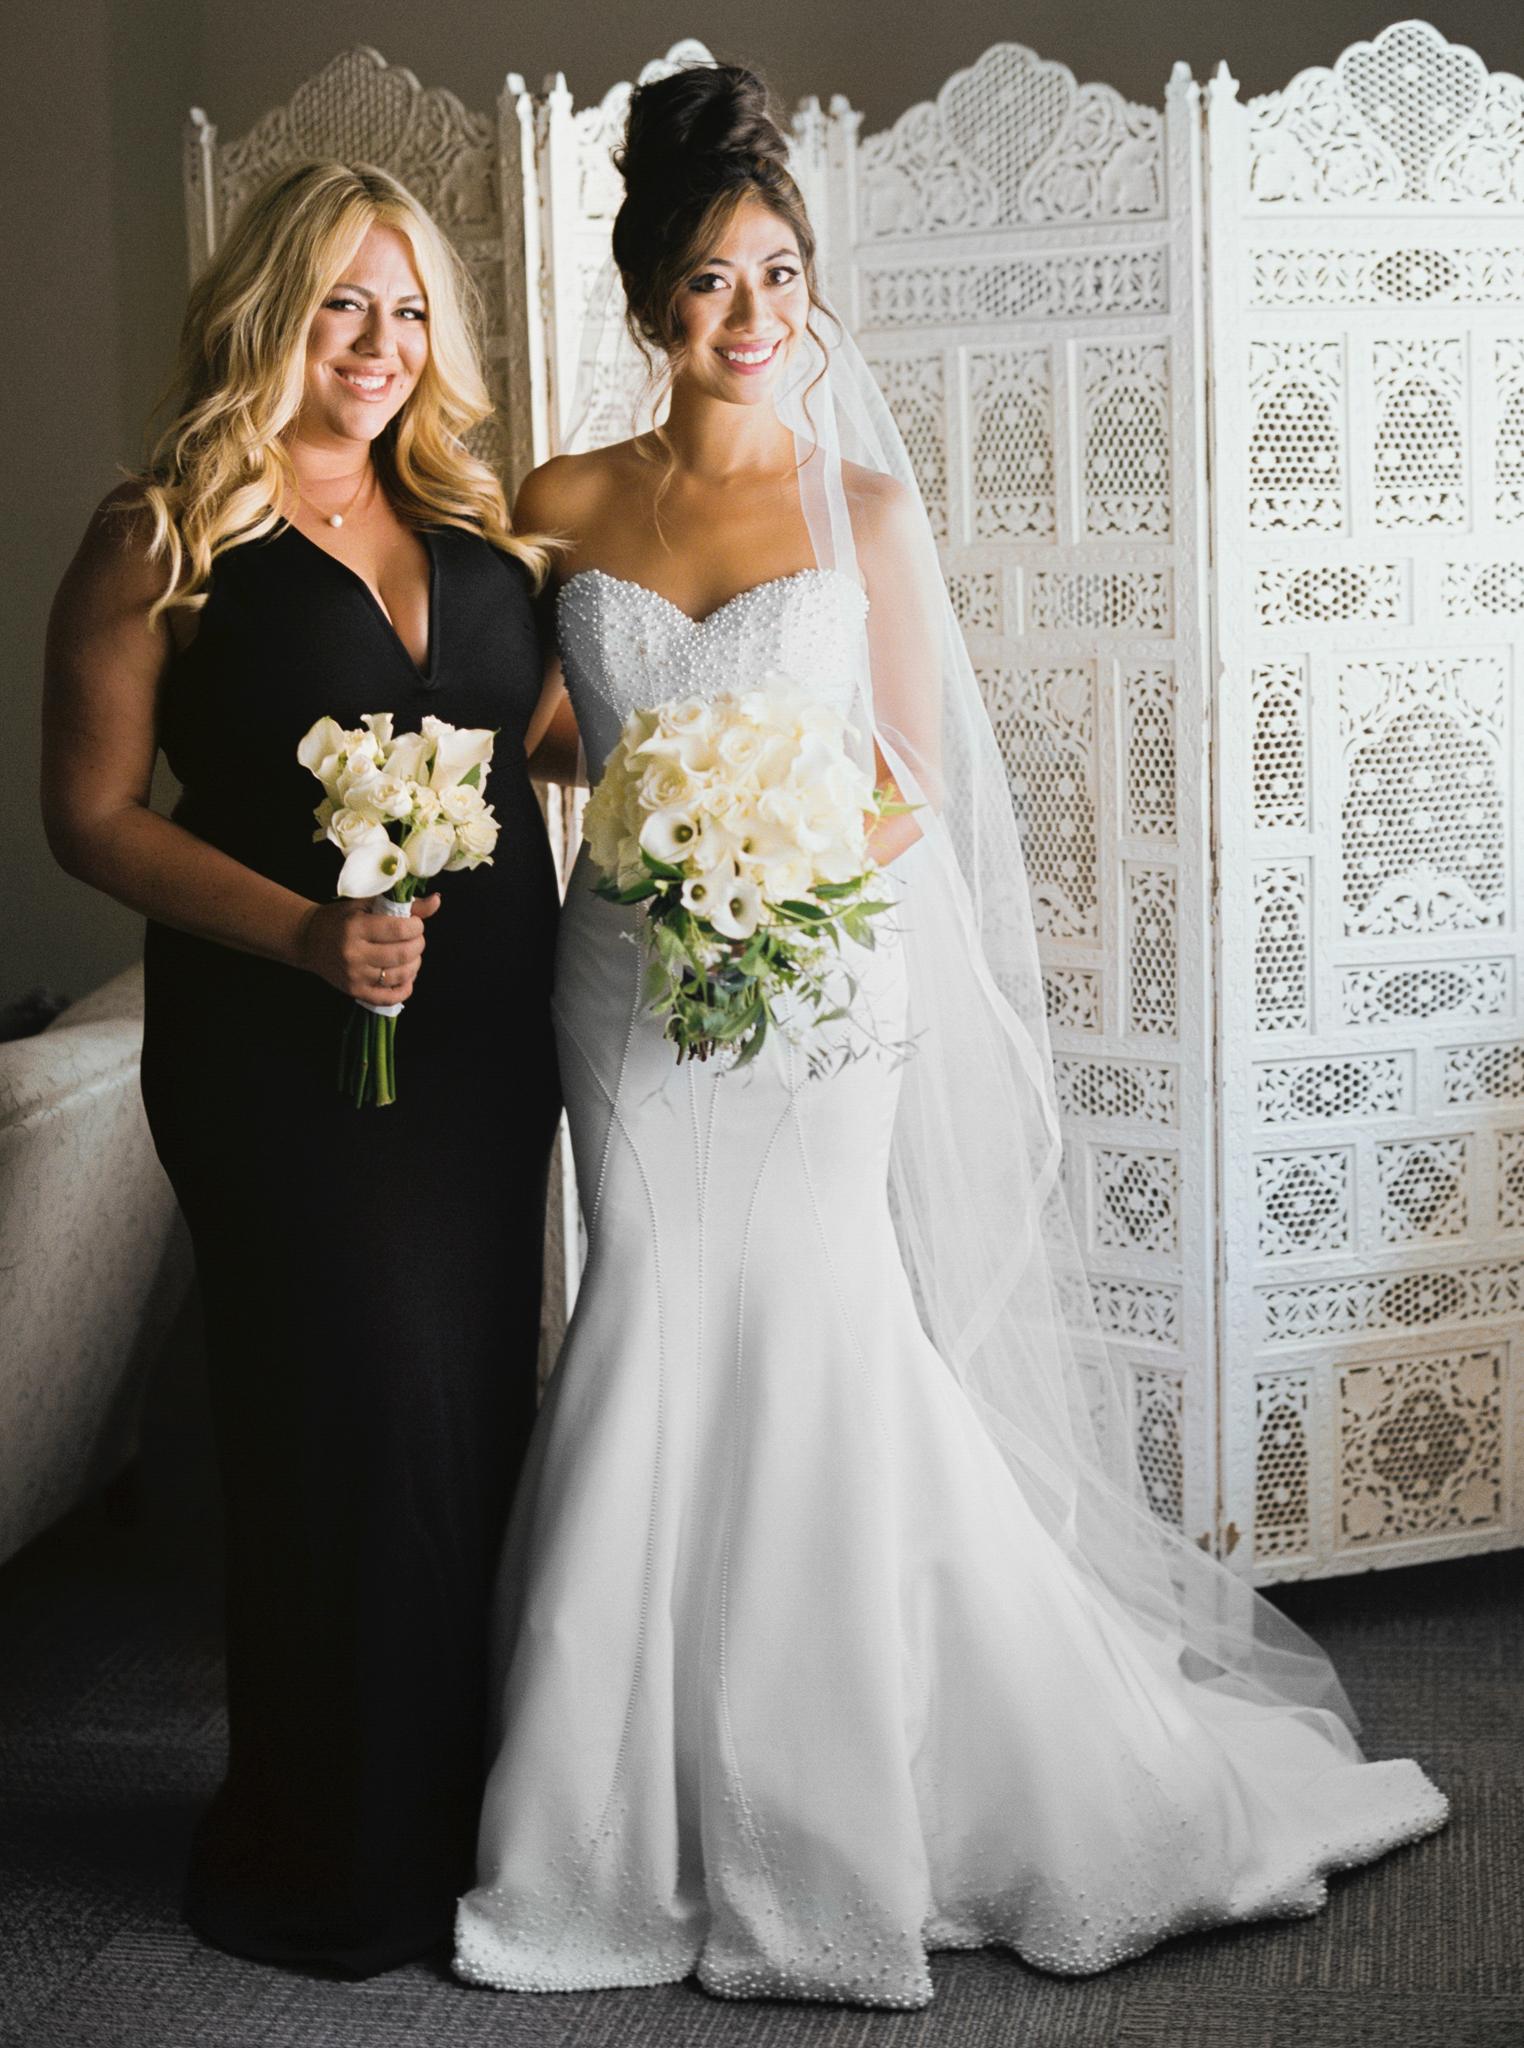 024OutliveCreative_Travel_Photographer_Videographer_Lewis&Clark_Oregon_Elegant_BlackTie_Destination_Wedding.jpg